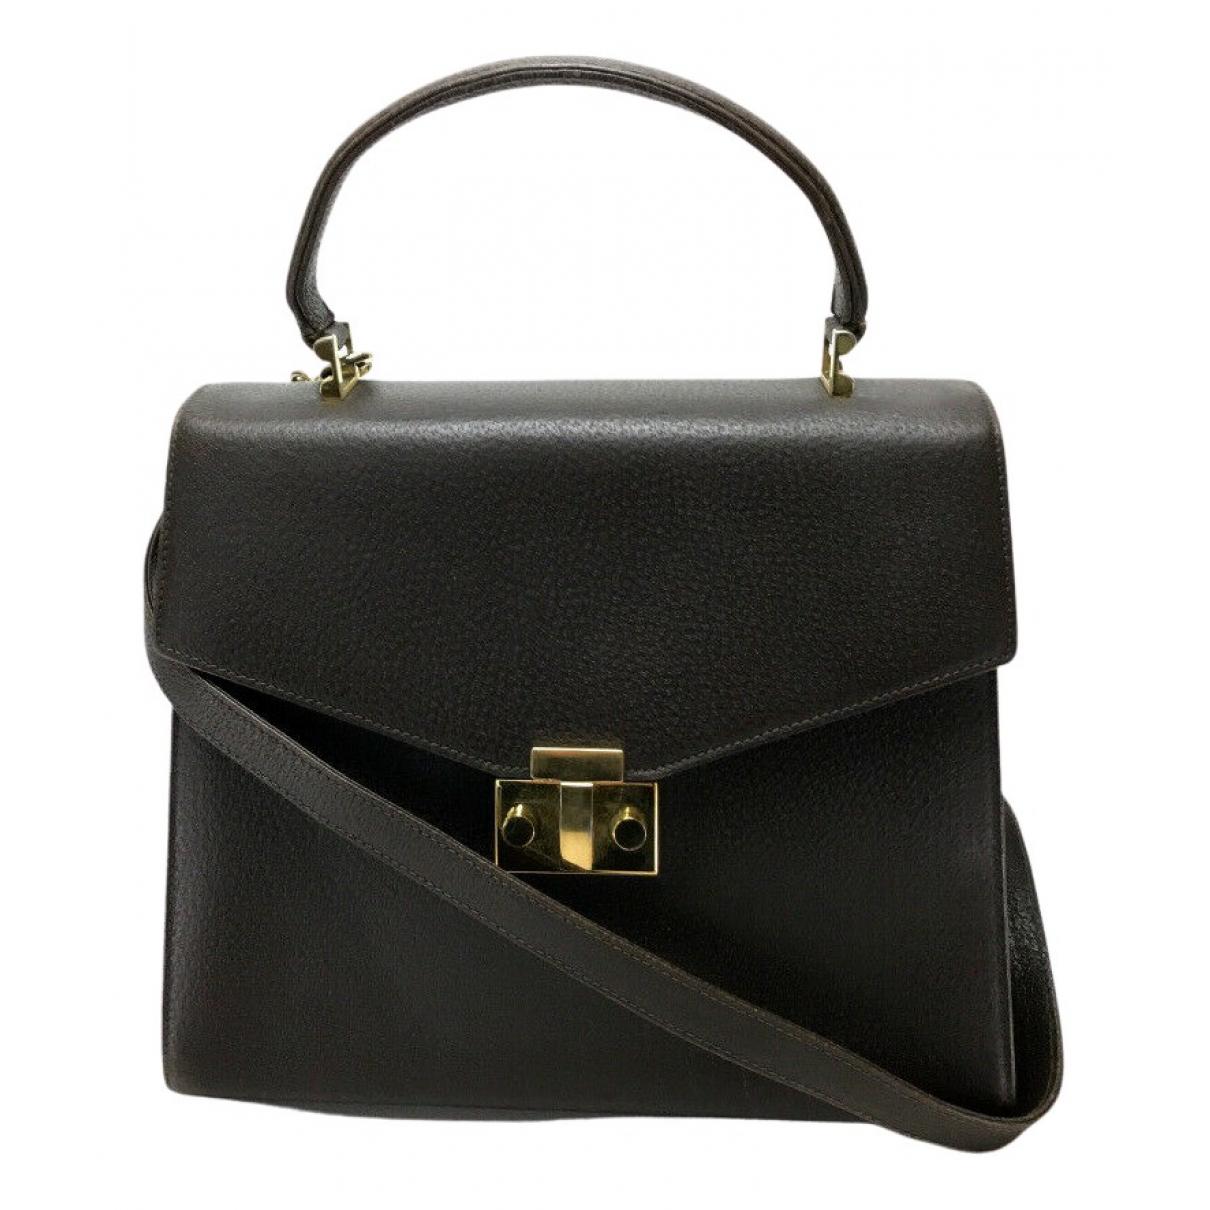 Tiffany & Co \N Handtasche in  Schwarz Leder